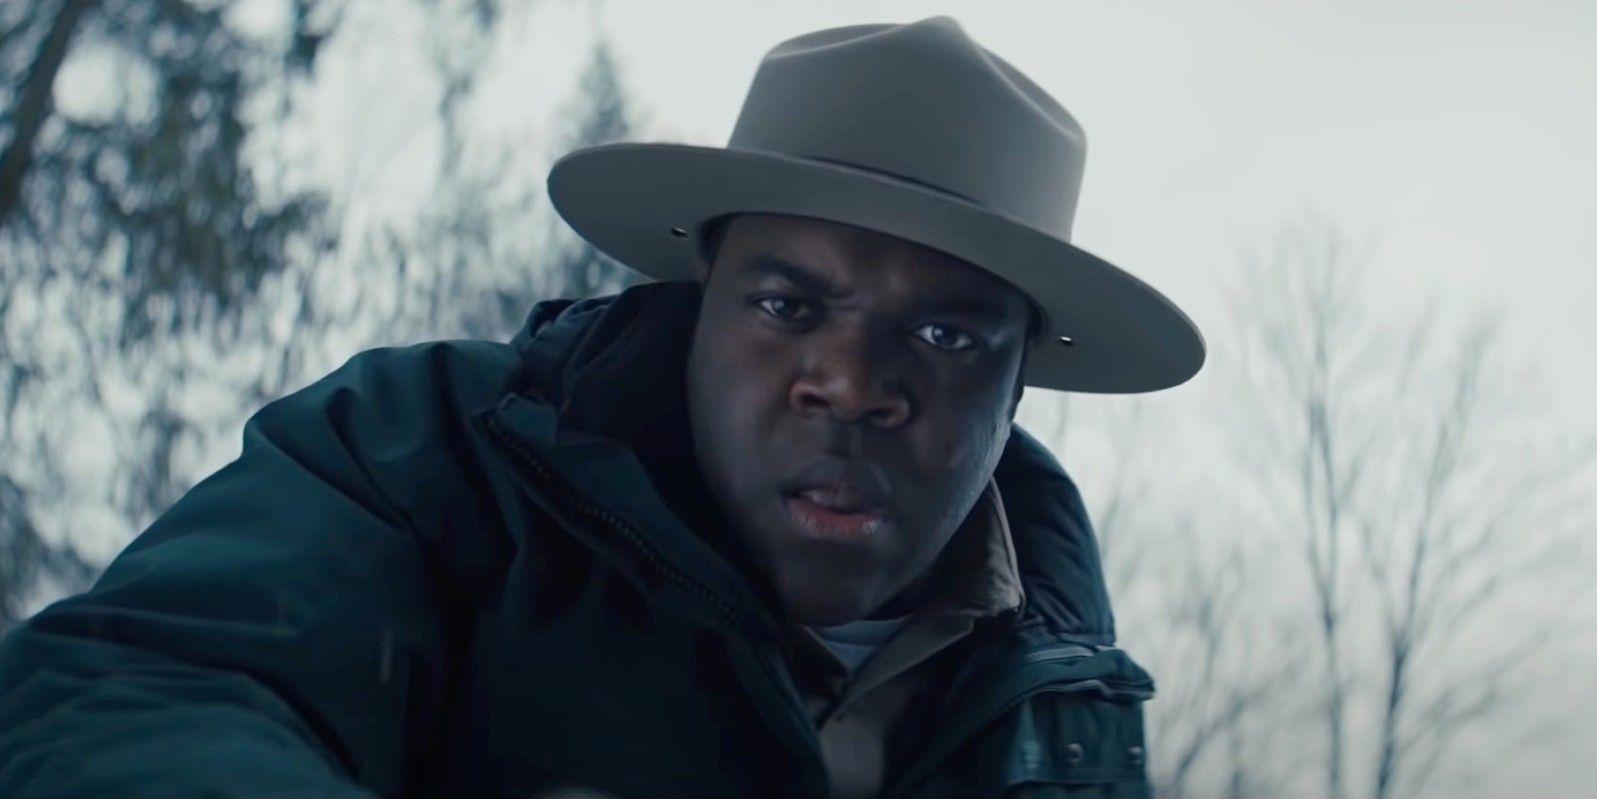 Hocus Pocus 2 Adds Veep's Sam Richardson To Cast | Screen Rant